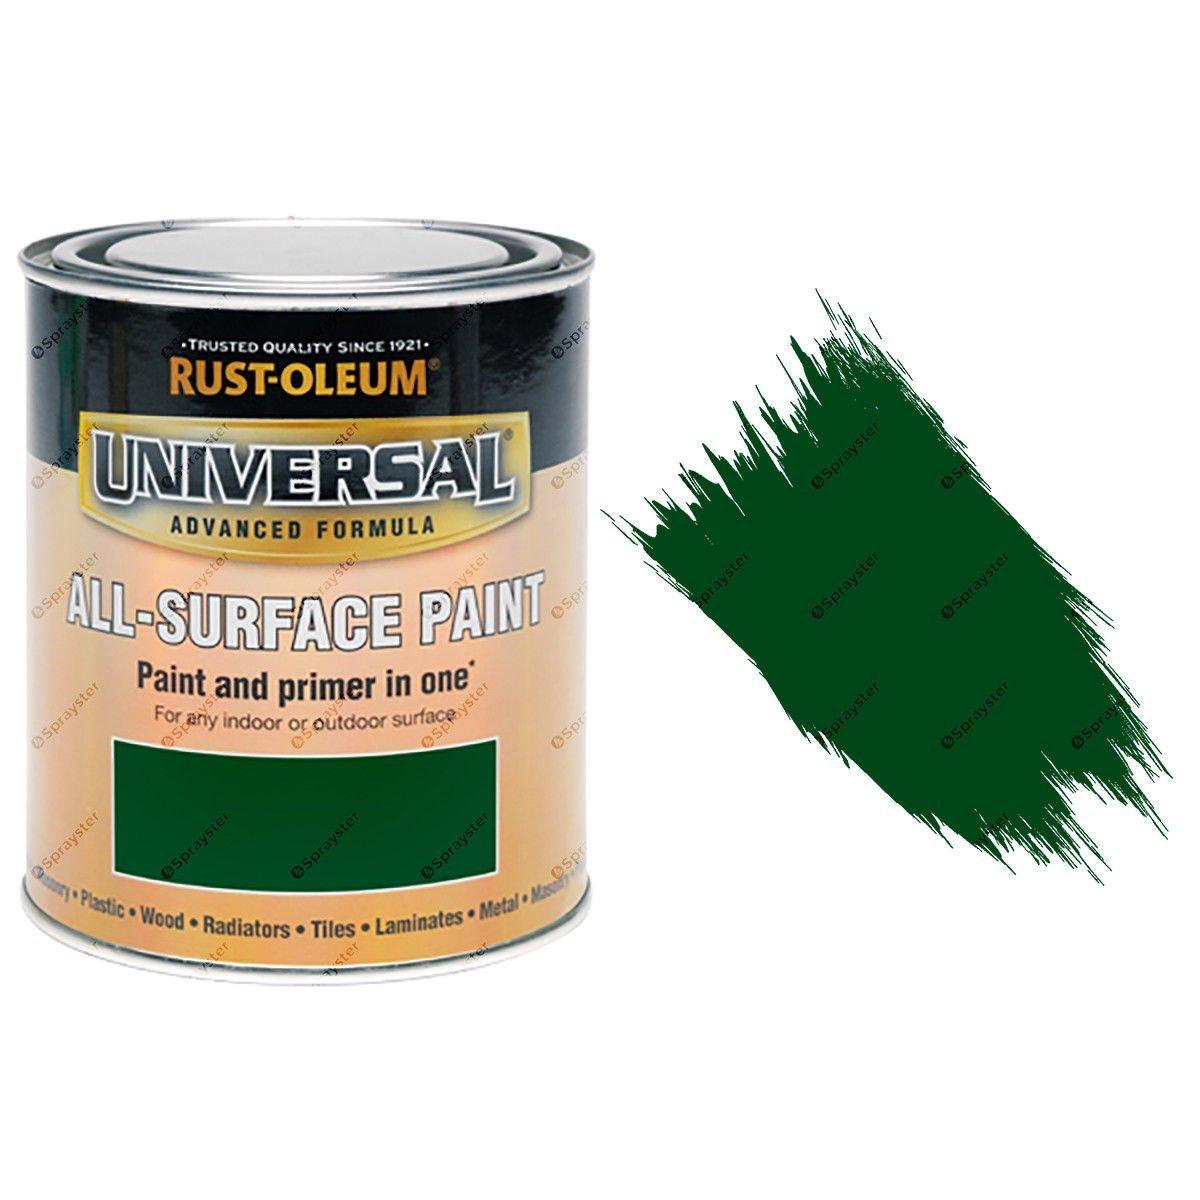 Rust-Oleum-Universal-All-Surface-Self-Primer-Paint-Gloss-Racing-Green-750ml-372229316276